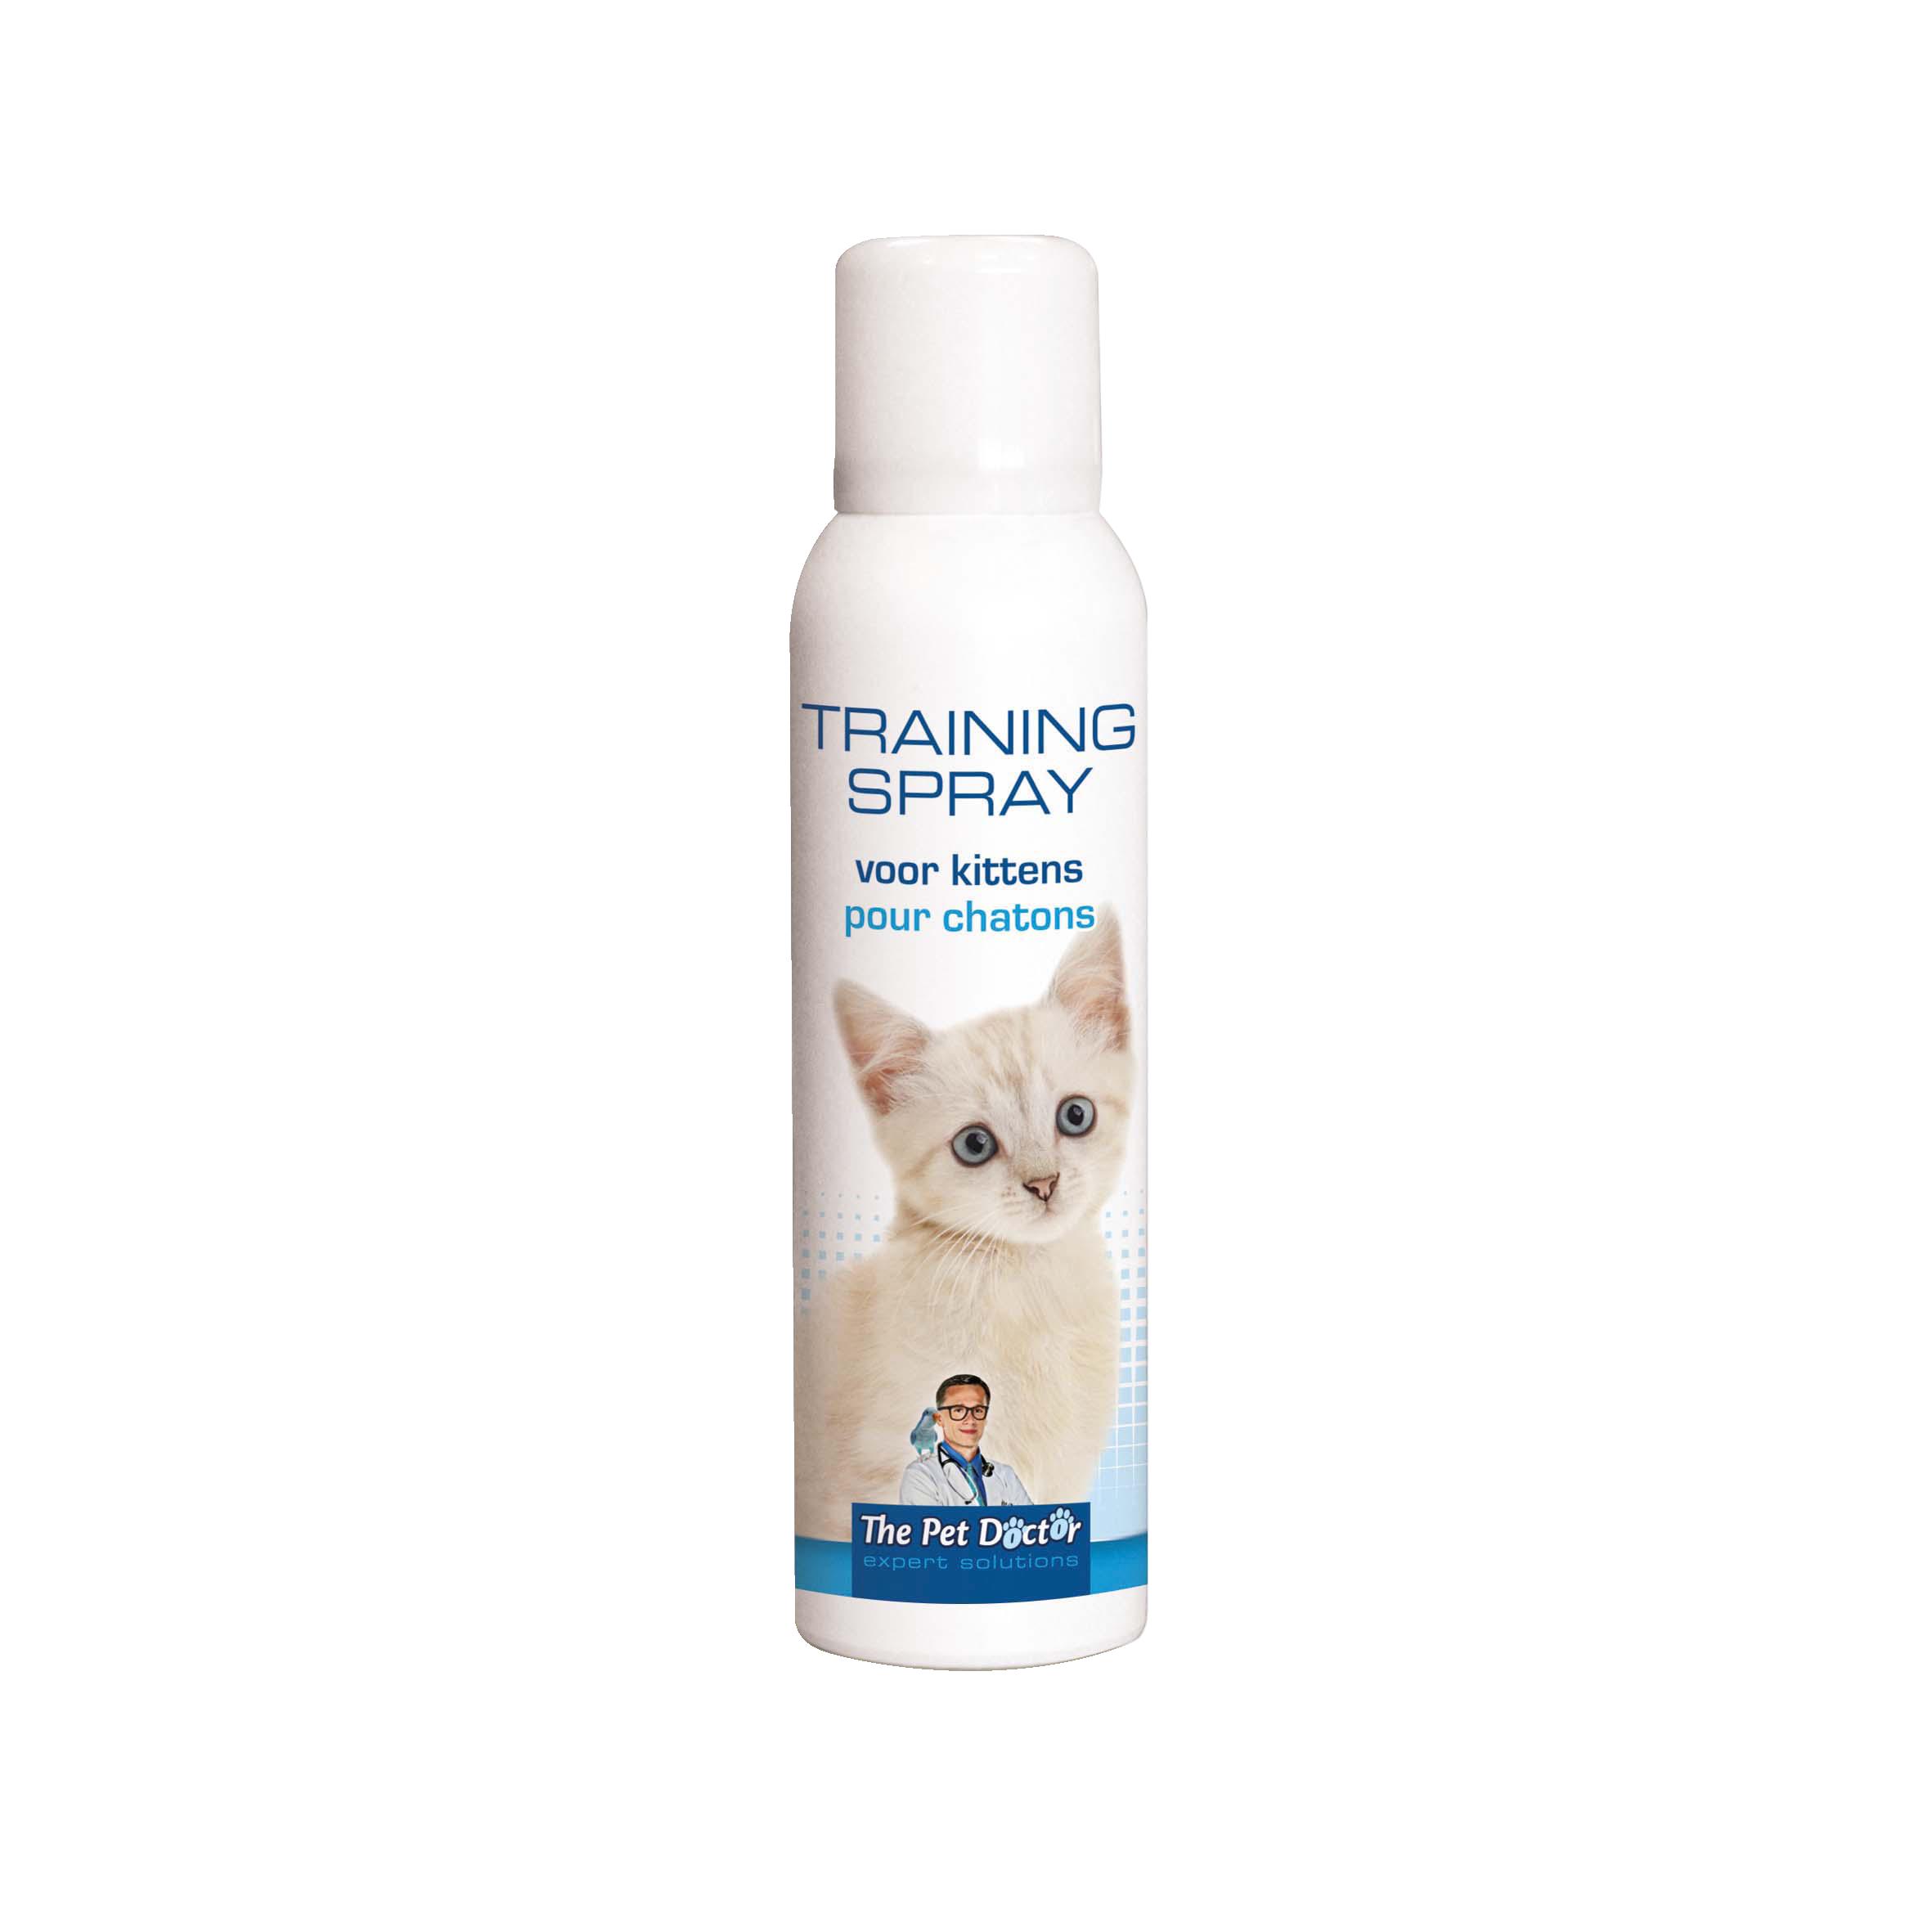 Trainingsspray Voor Kittens 120 ml